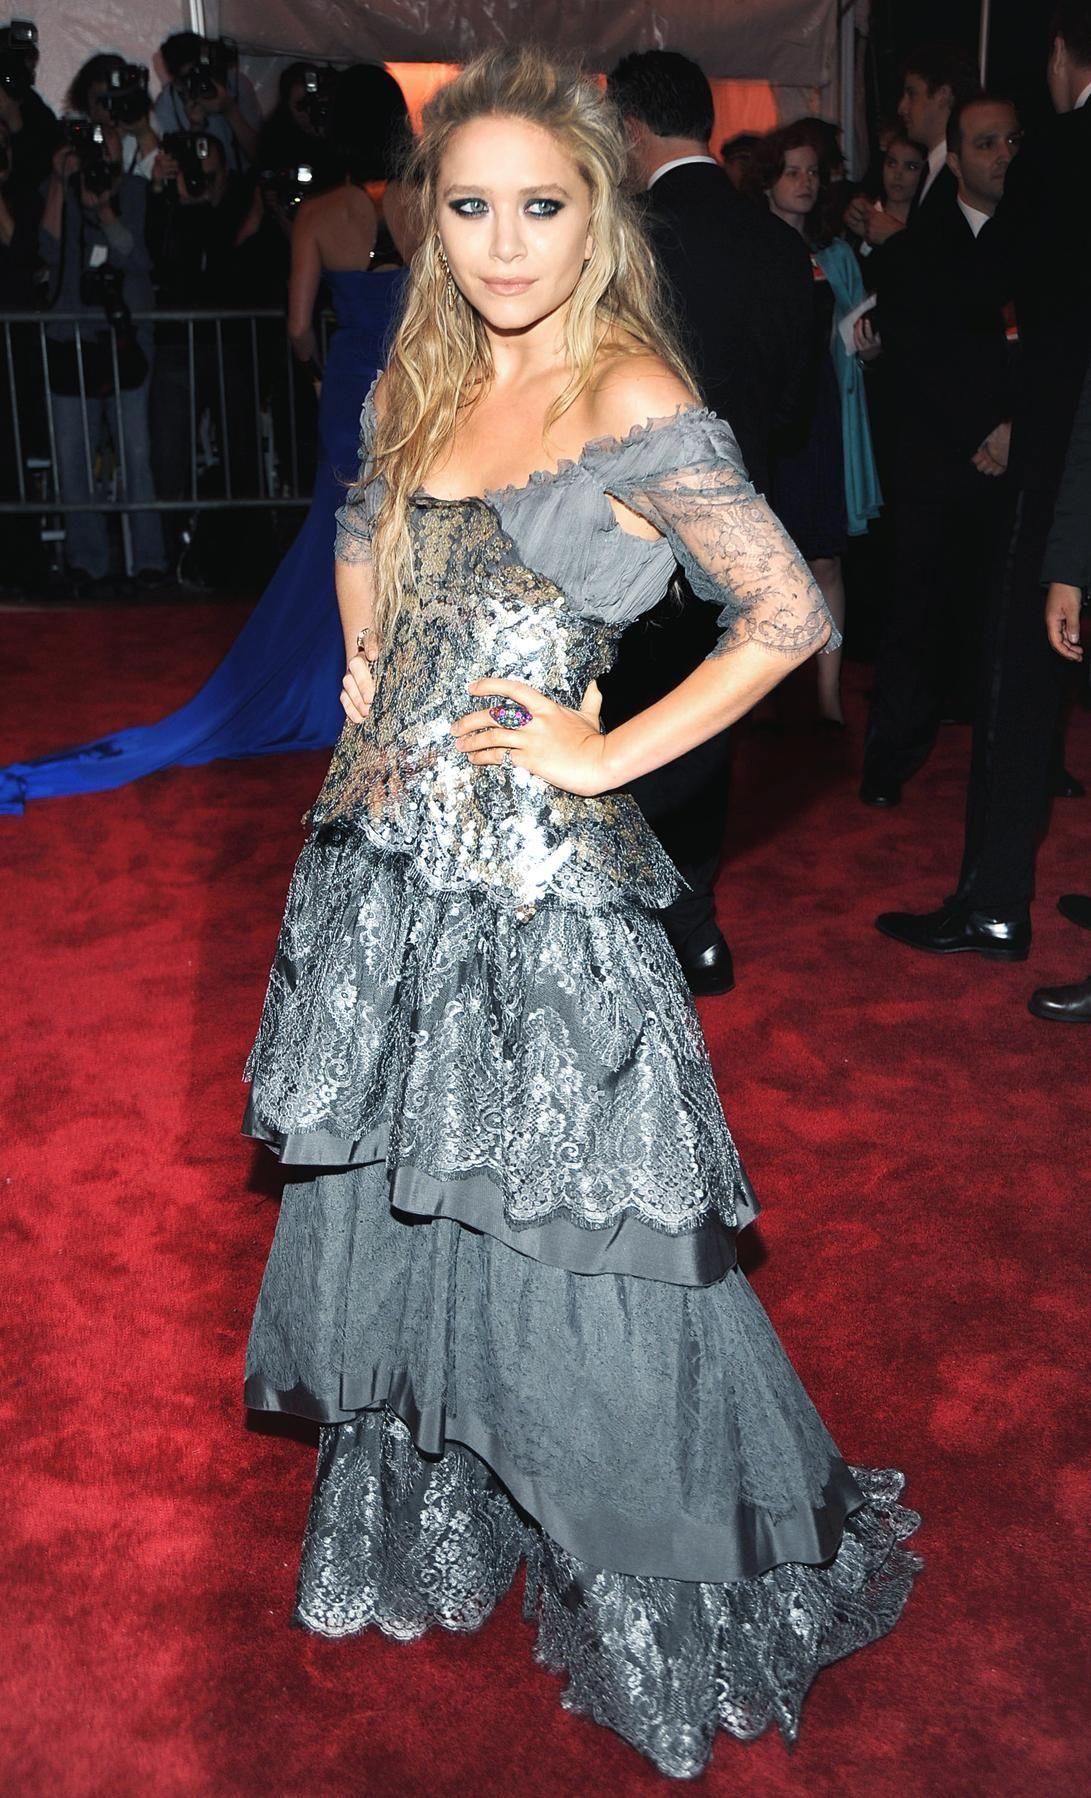 Mary-Kate Olsen at the Met Costume Institute Gala, 2009